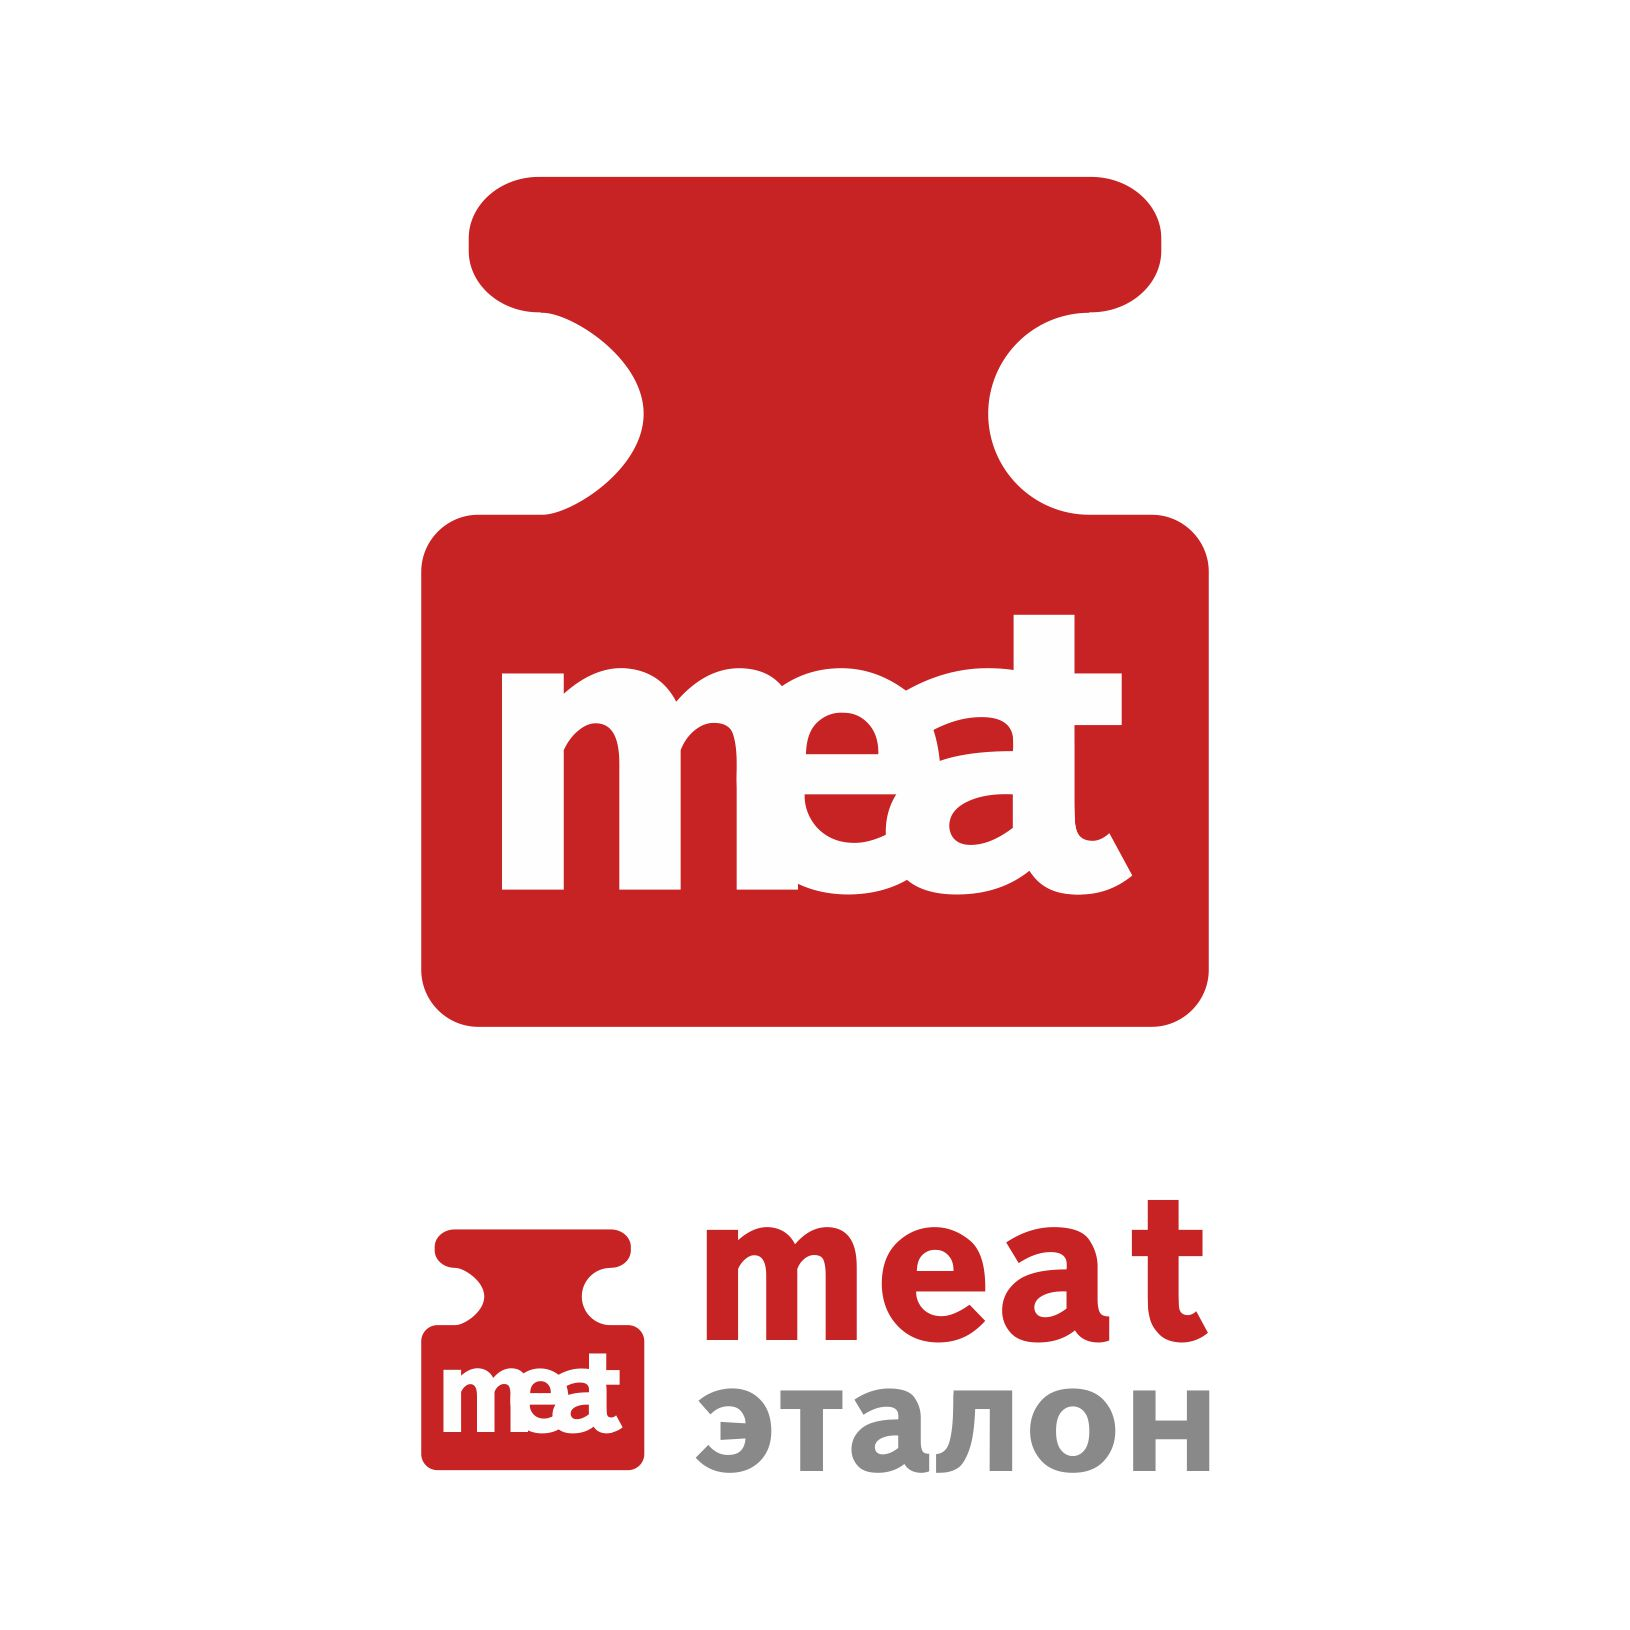 Логотип компании «Meat эталон» фото f_69856f2b5d9b7604.jpg